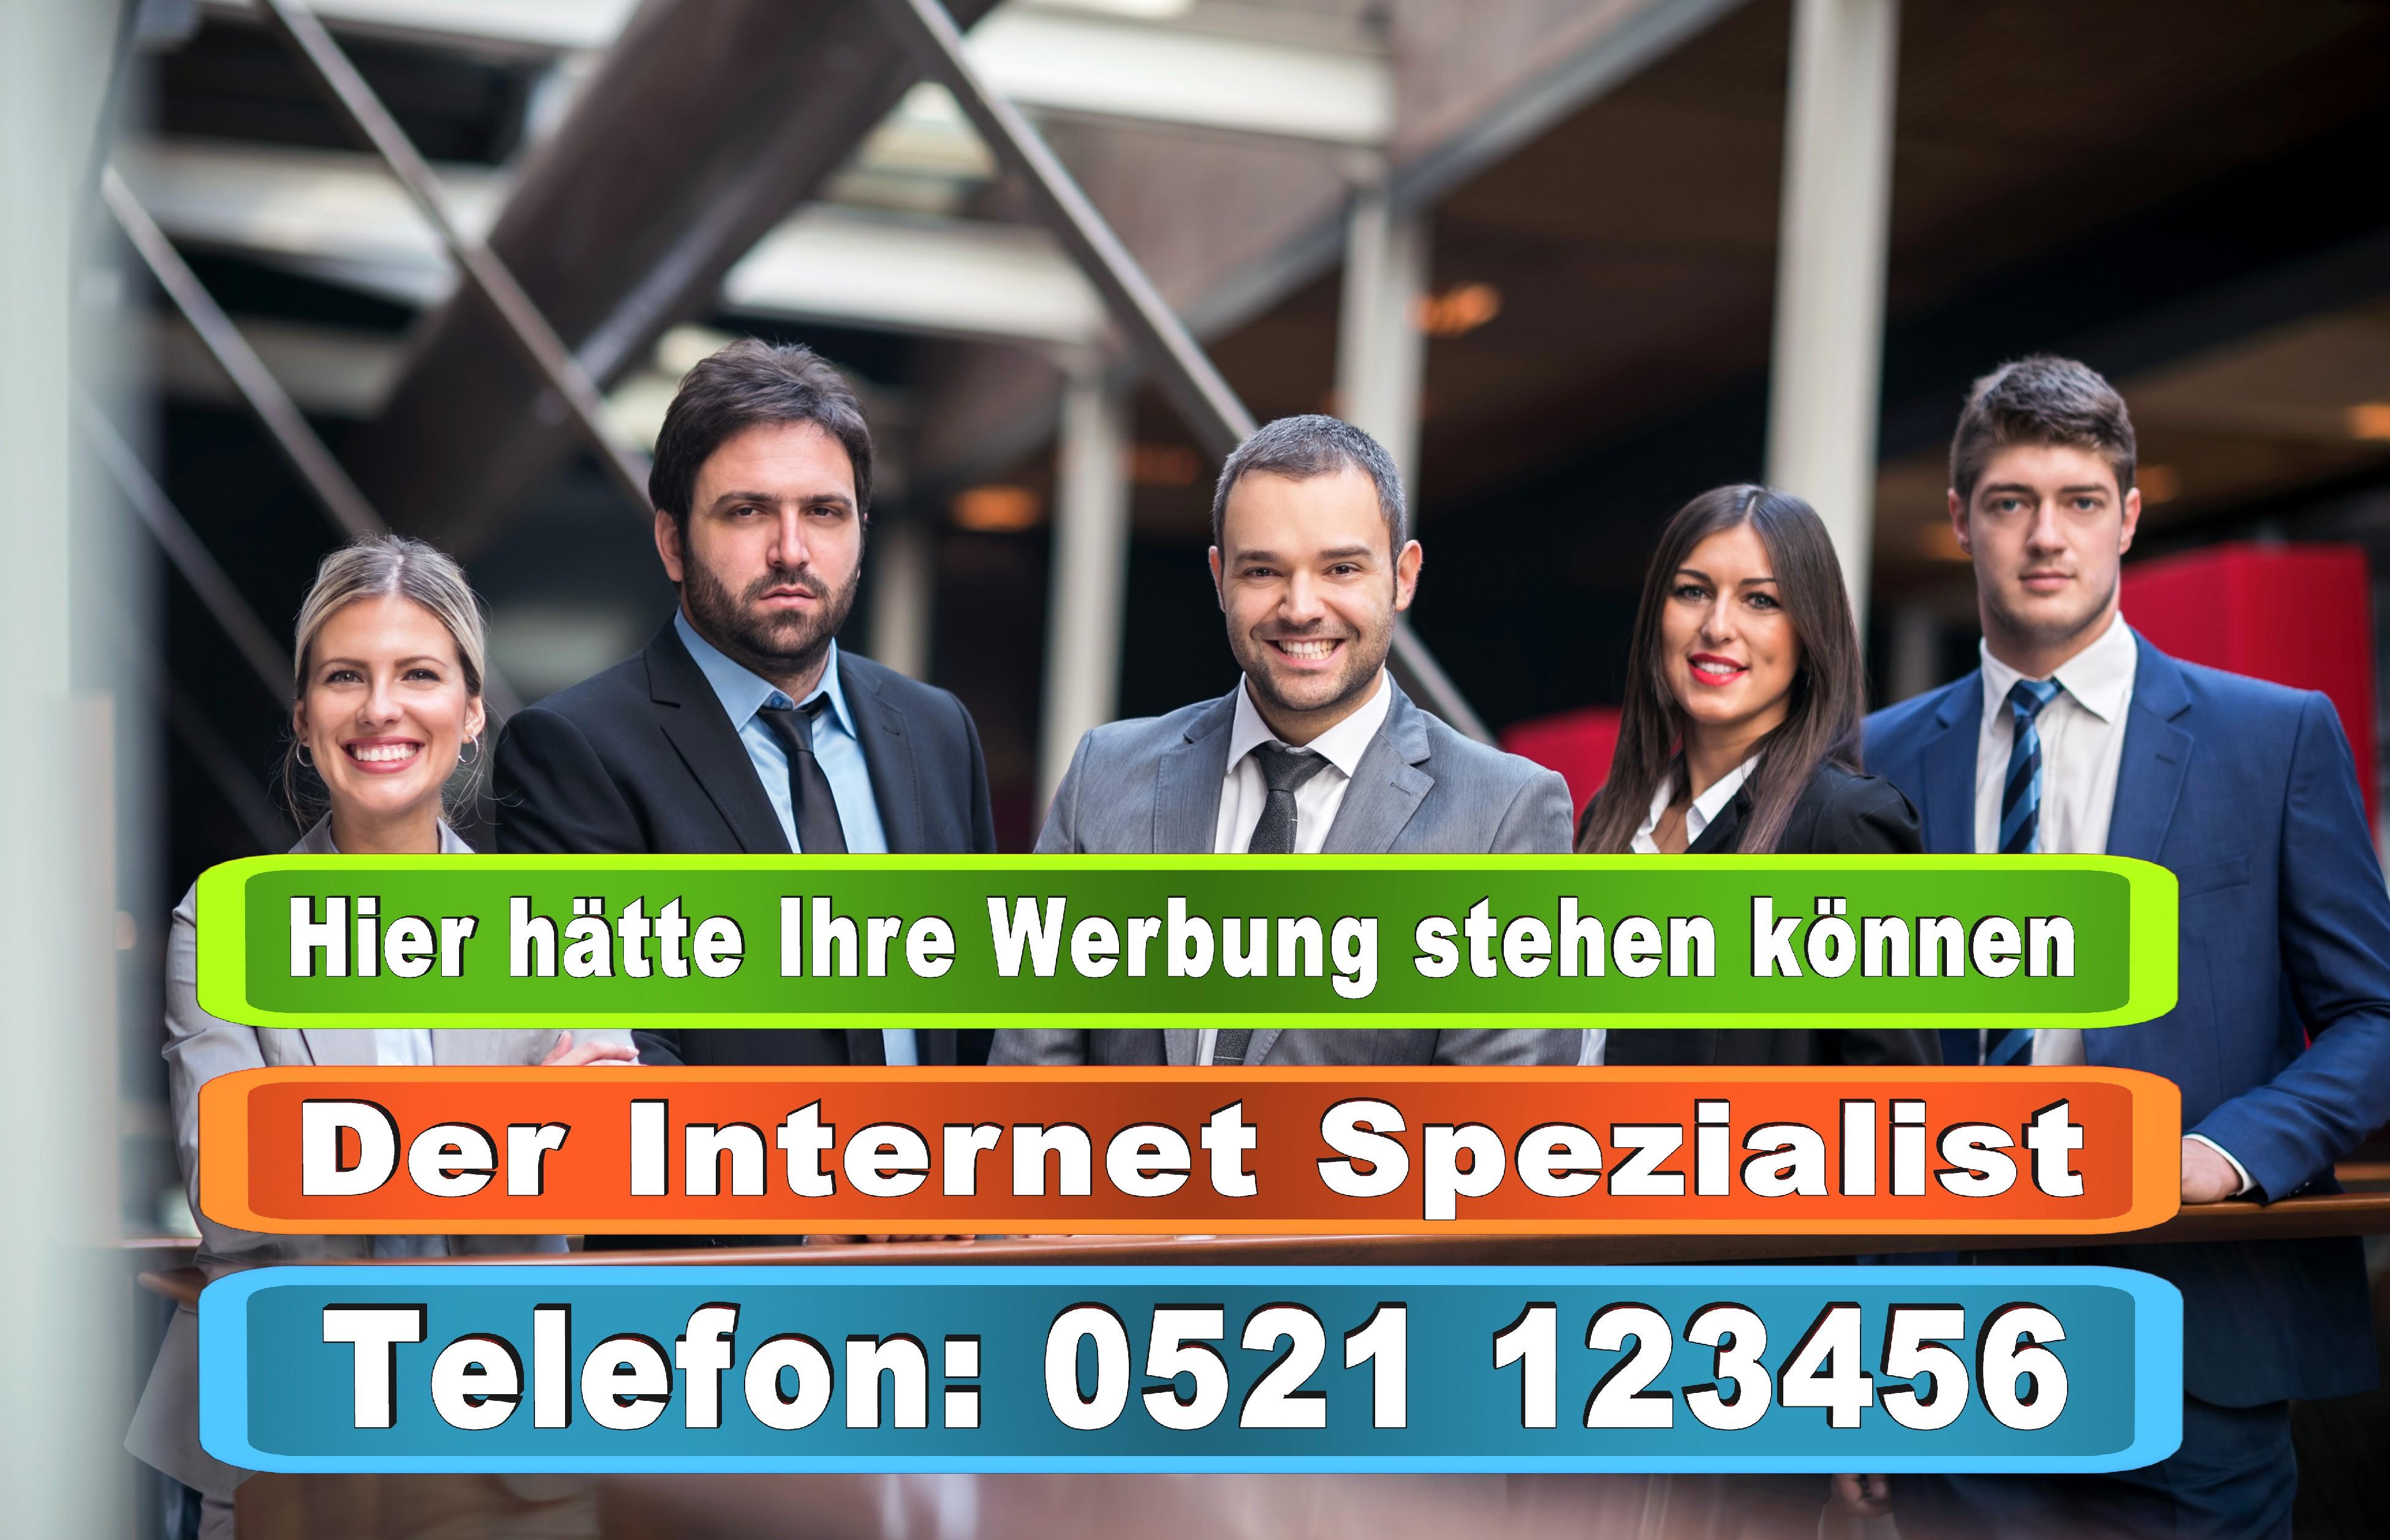 Rechtsanwaltskanzlei Bielefeld NRW OWL Rechtsanwalt Kanzlei Büro Steuerberater Bielefeld Architekt Bielefeld (17)